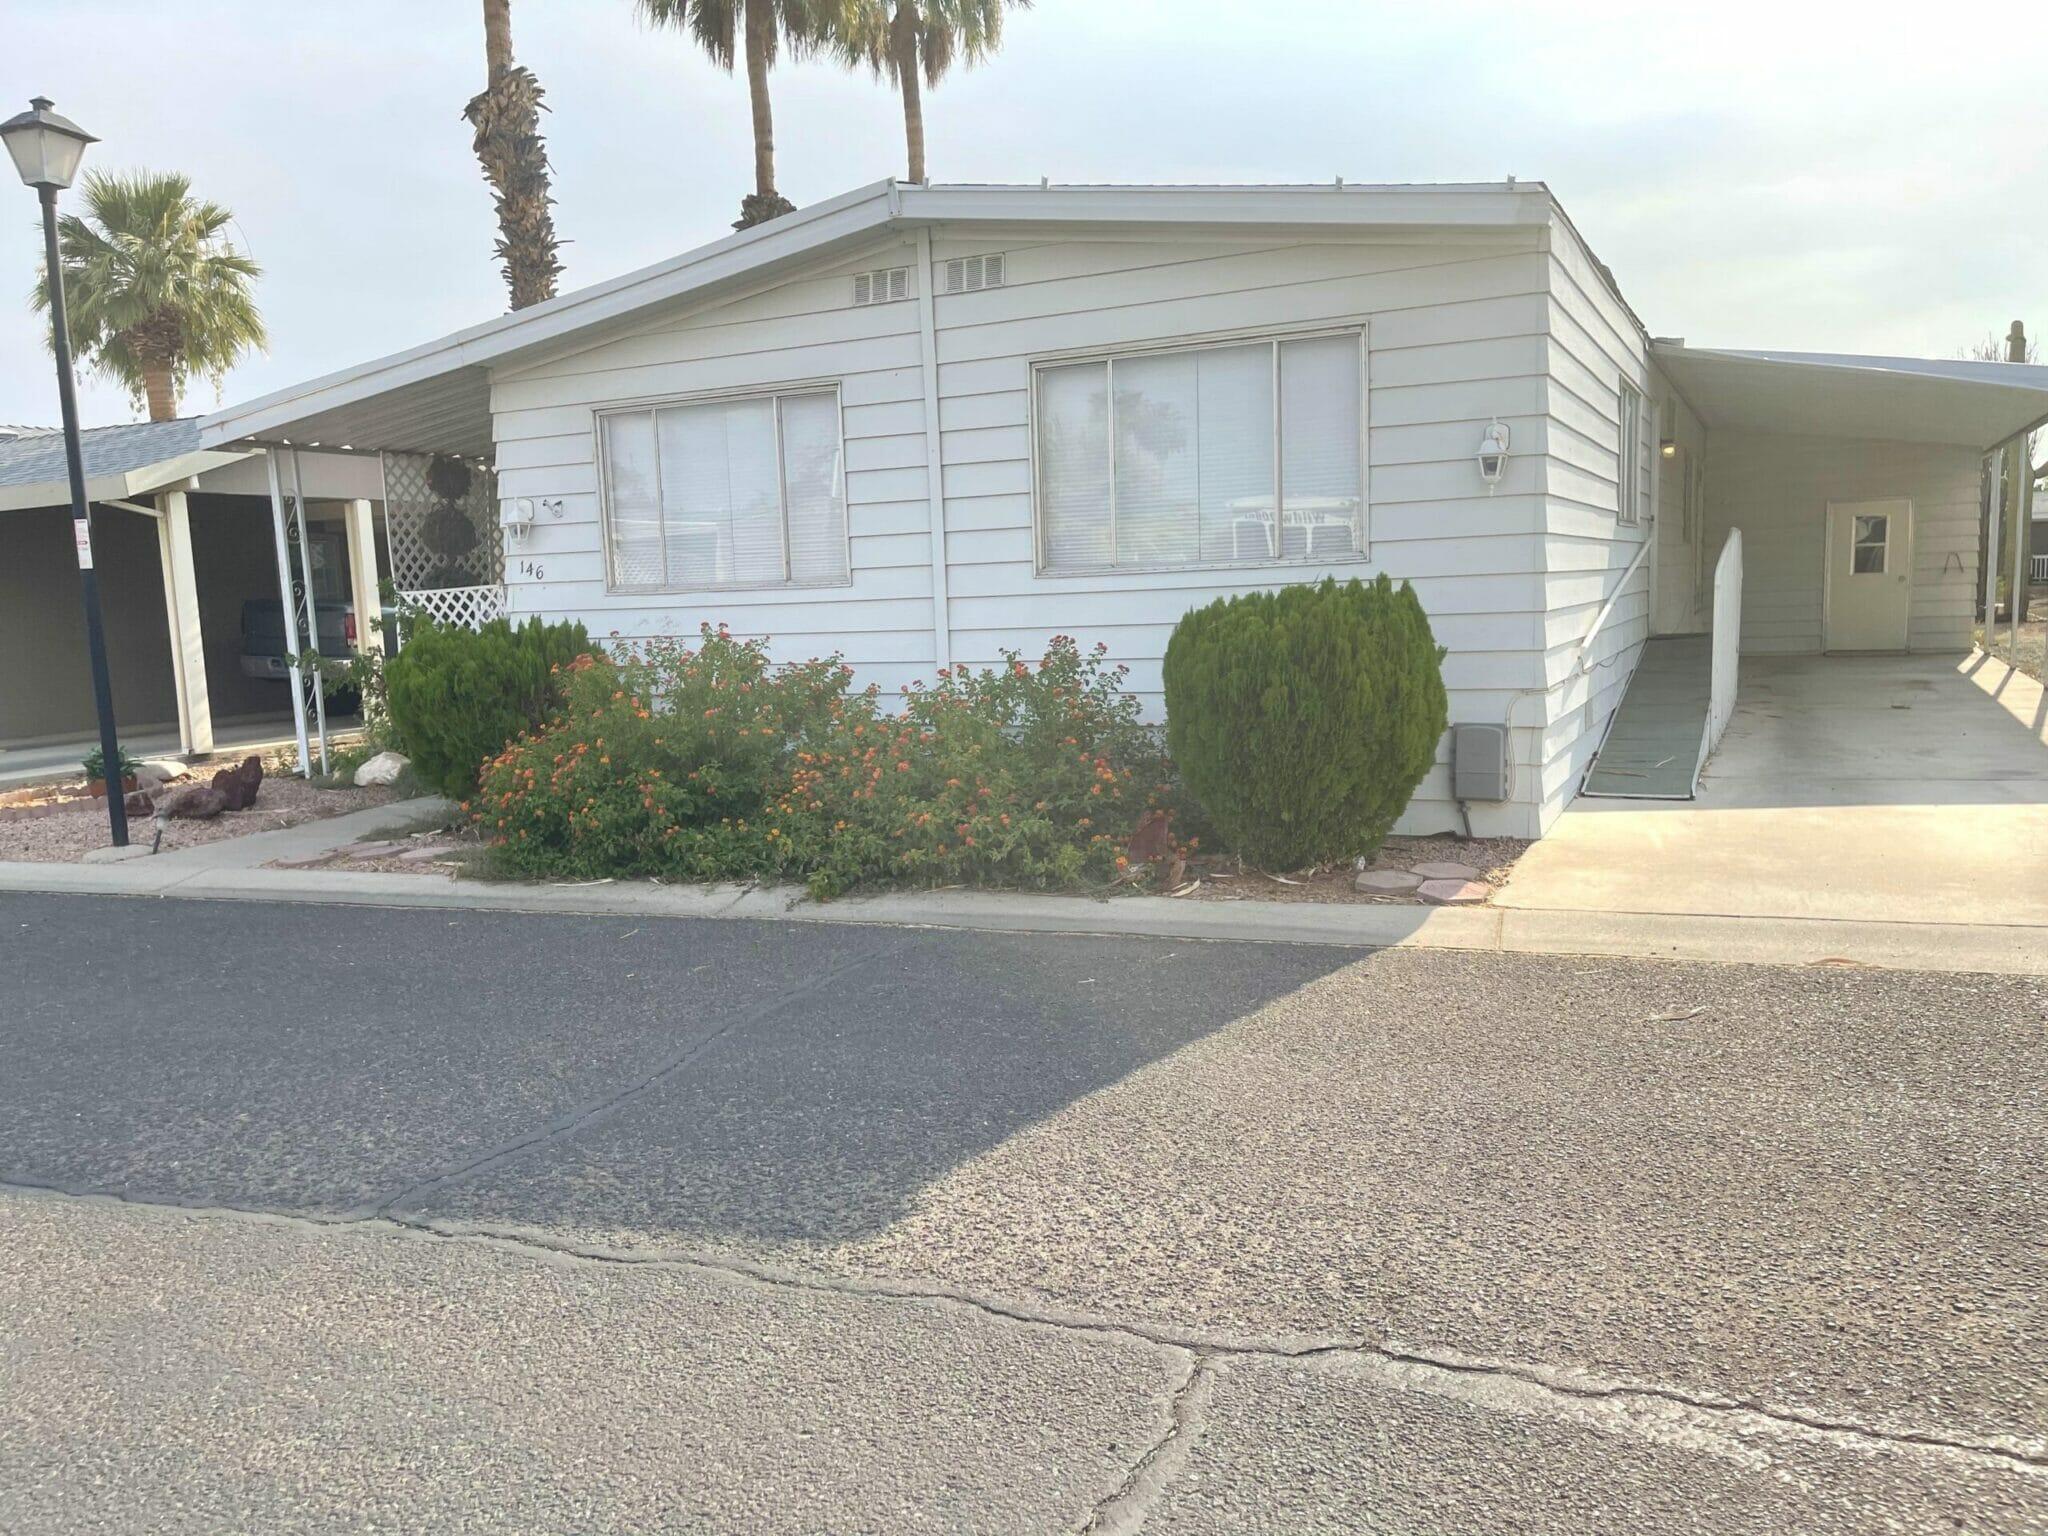 10960 N 67th Ave #146, Glendale, AZ 85304